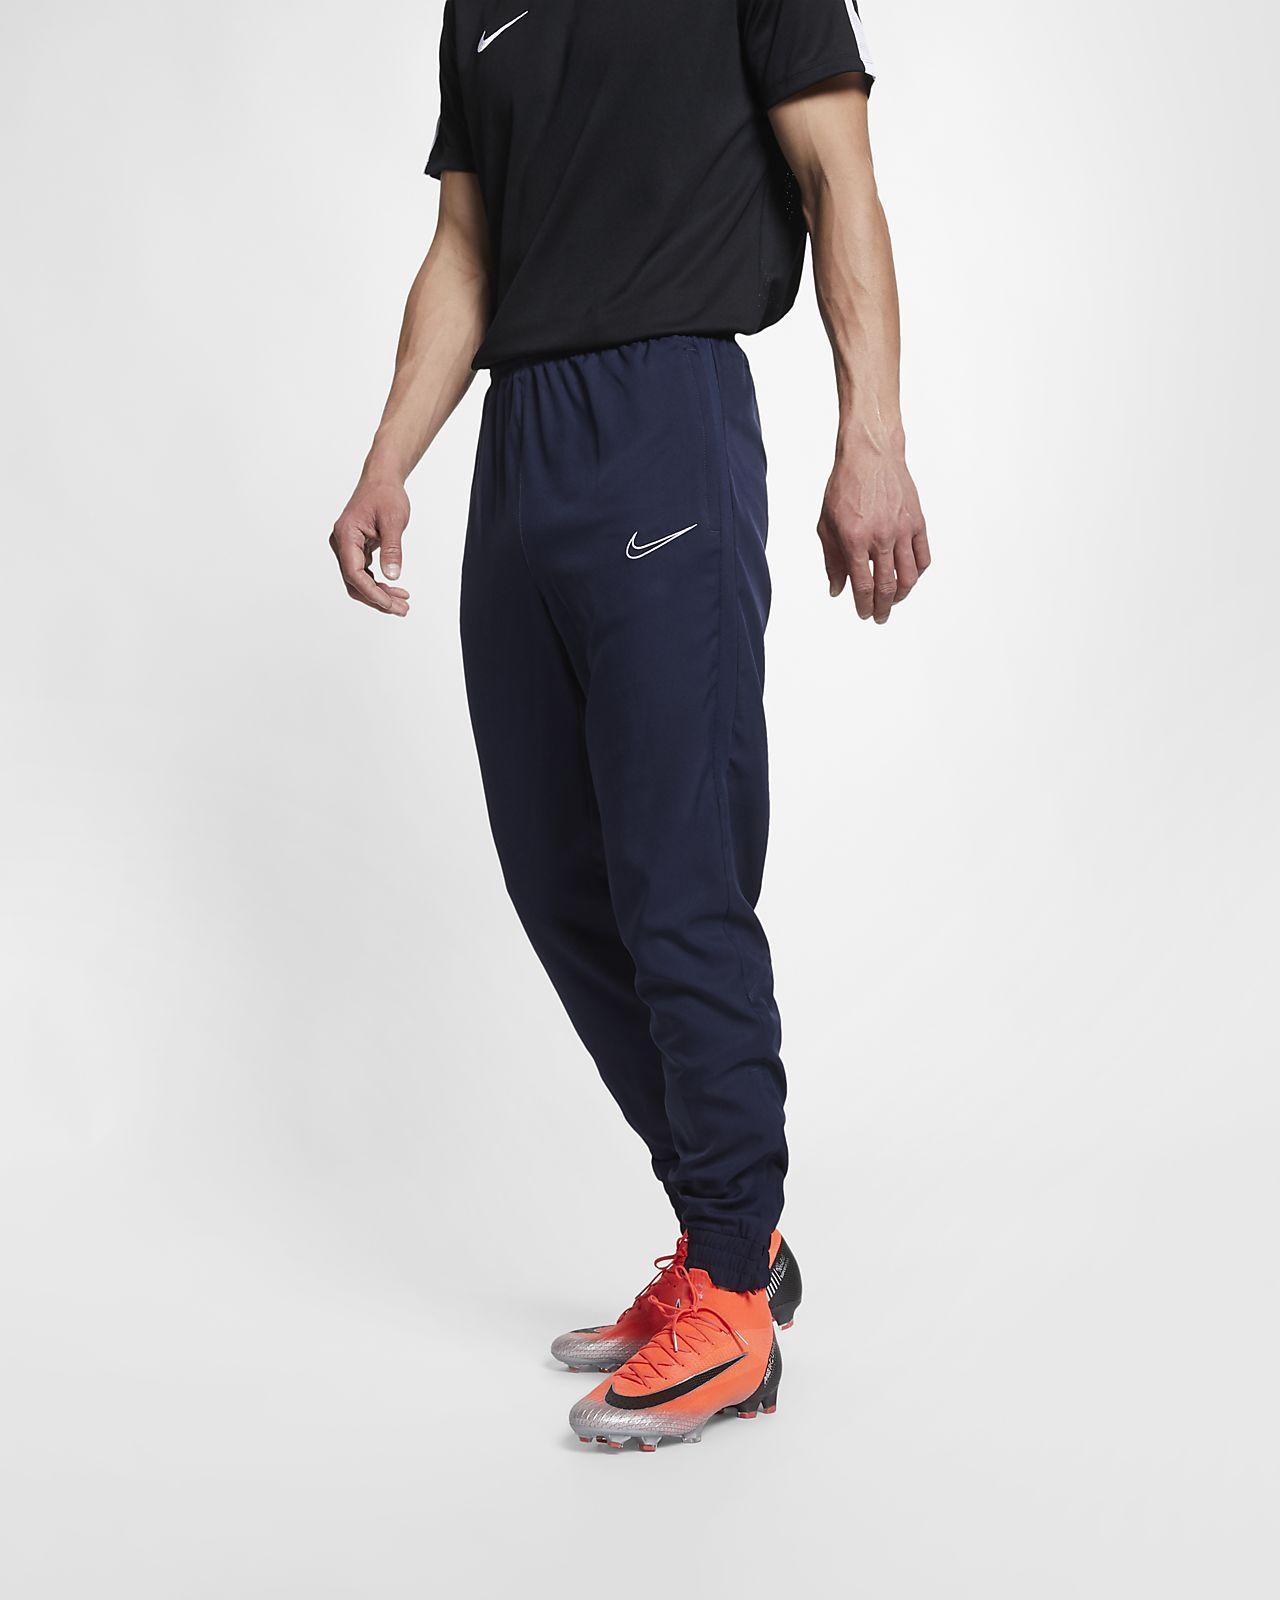 93b230dc5f14fa Nike Dri-FIT Academy Herren-Fußballhose. Nike.com DE